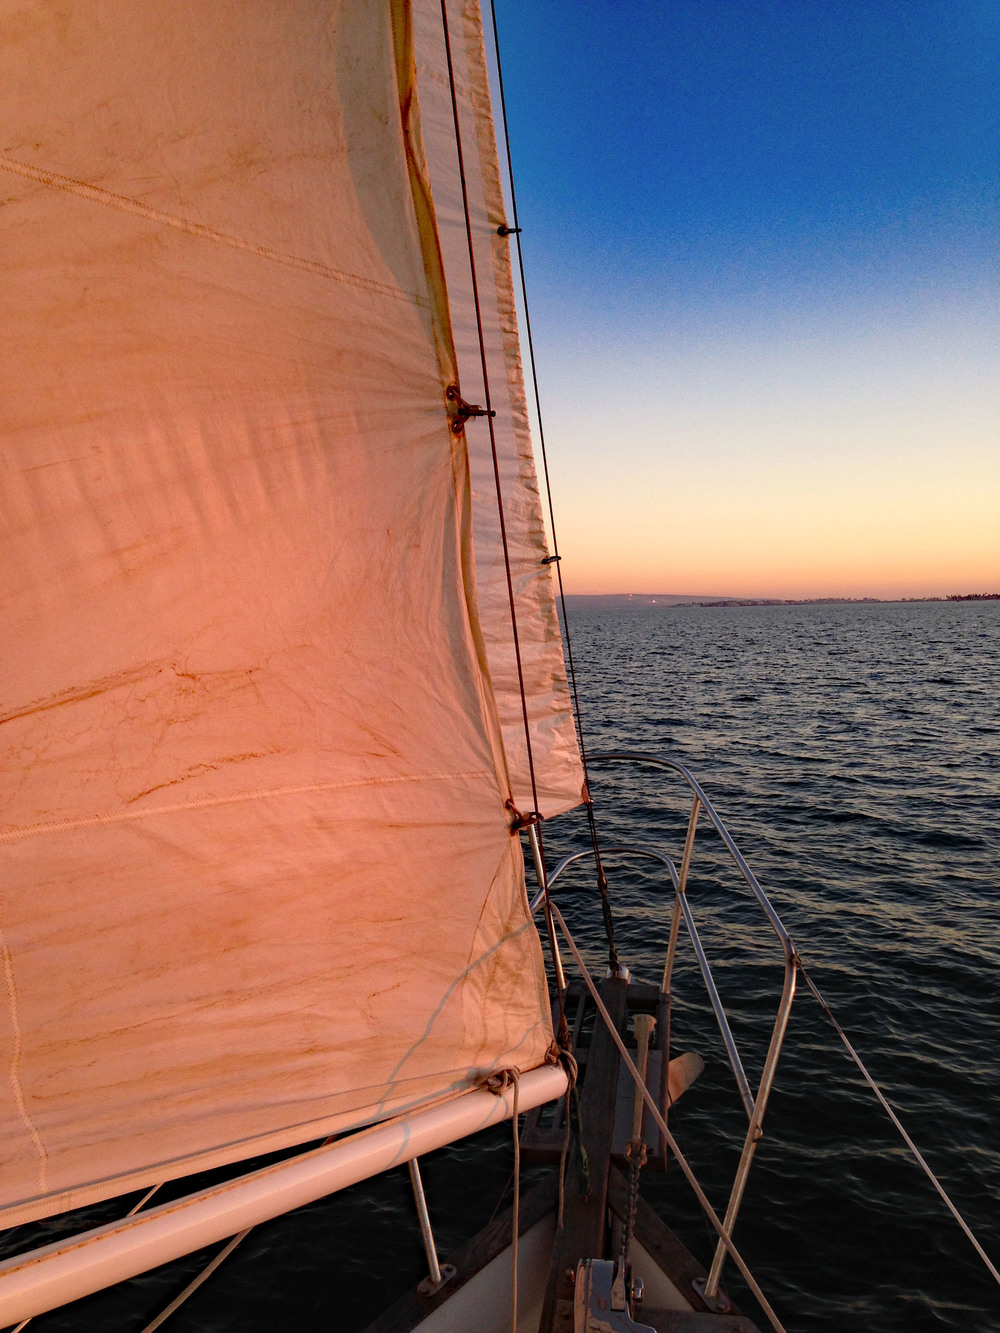 Sailing in San Diego Bay Sunset